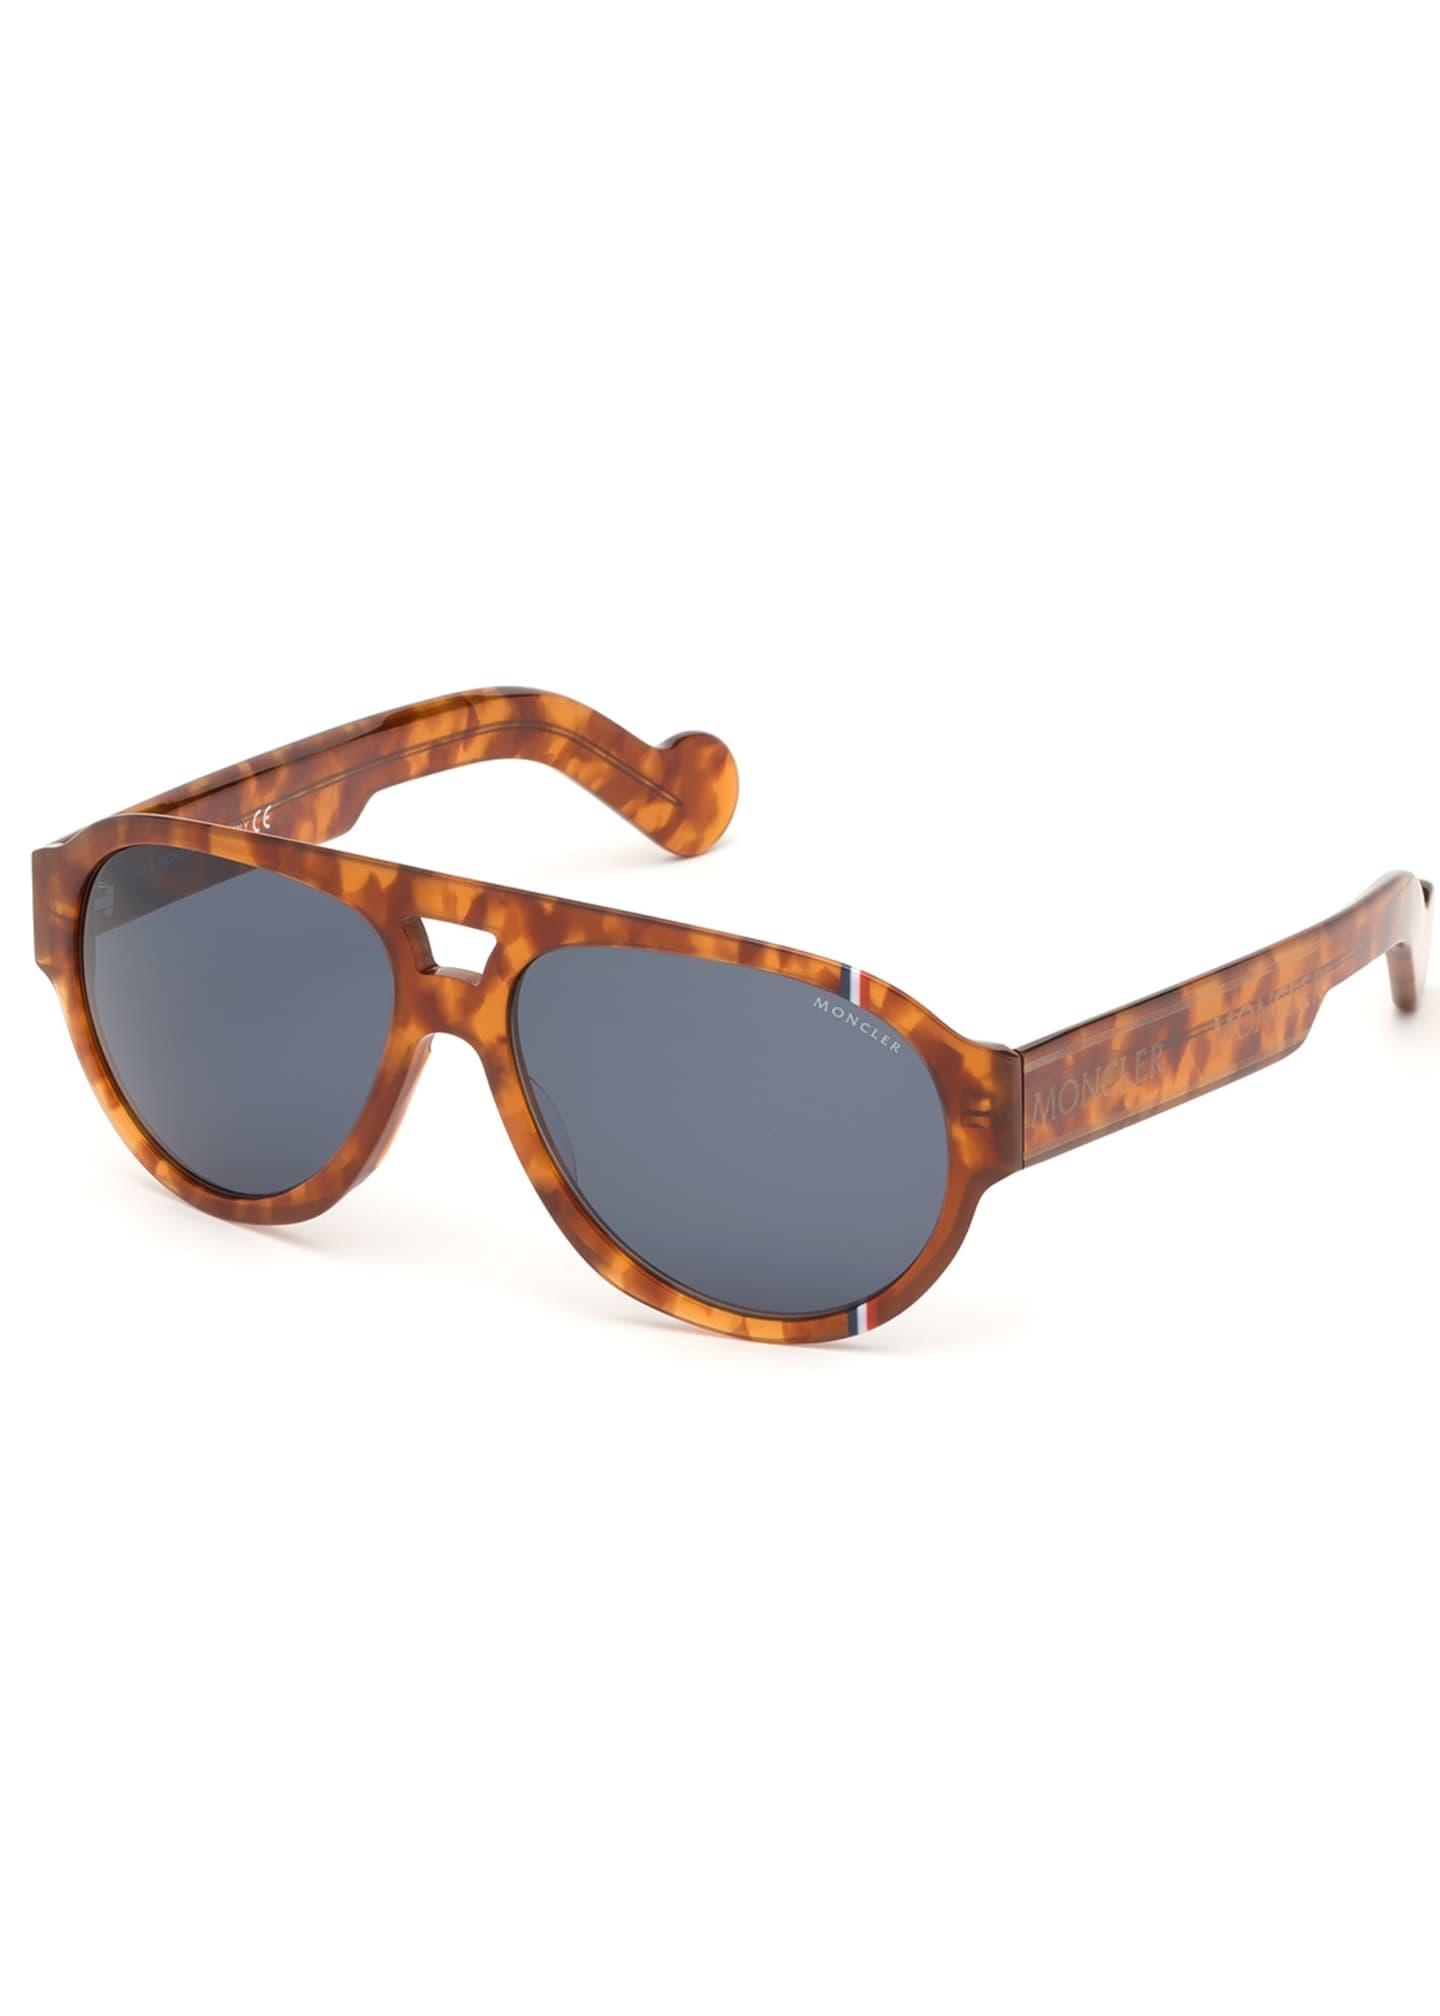 Moncler Tricolor Aviator Acetate Sunglasses